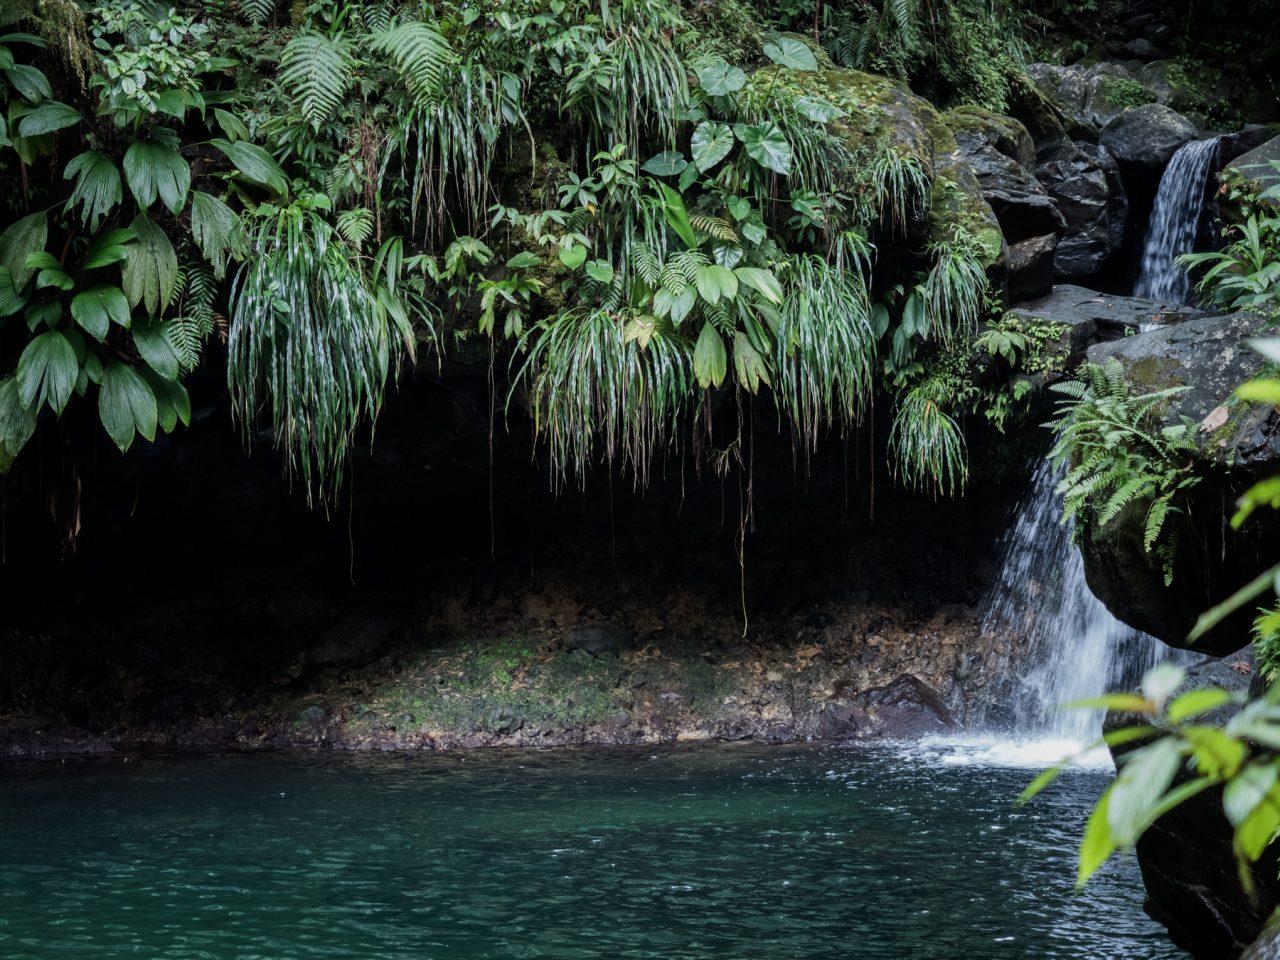 cascade paradise guadeloupe - capesterre belle eau - guadeloupe foret tropicale